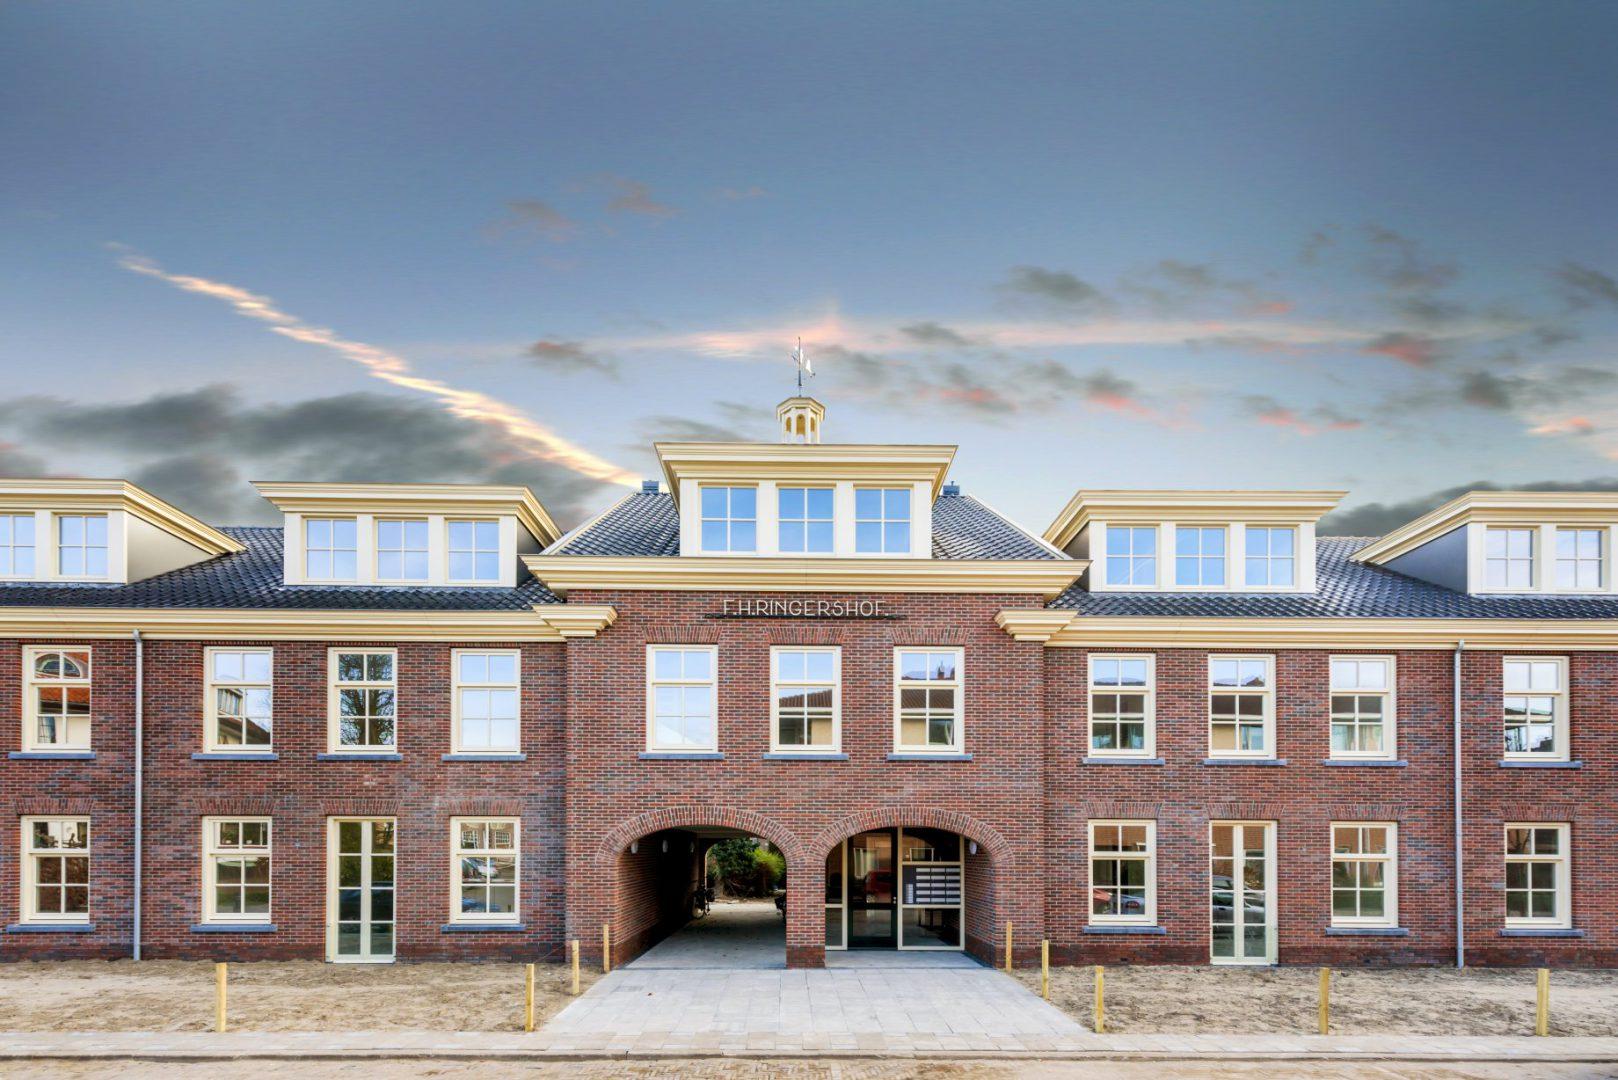 Ringershof-renovatie-ZIJLSTRA-SCHIPPER-architecten-architectenbureau-noord-holland-architect-002